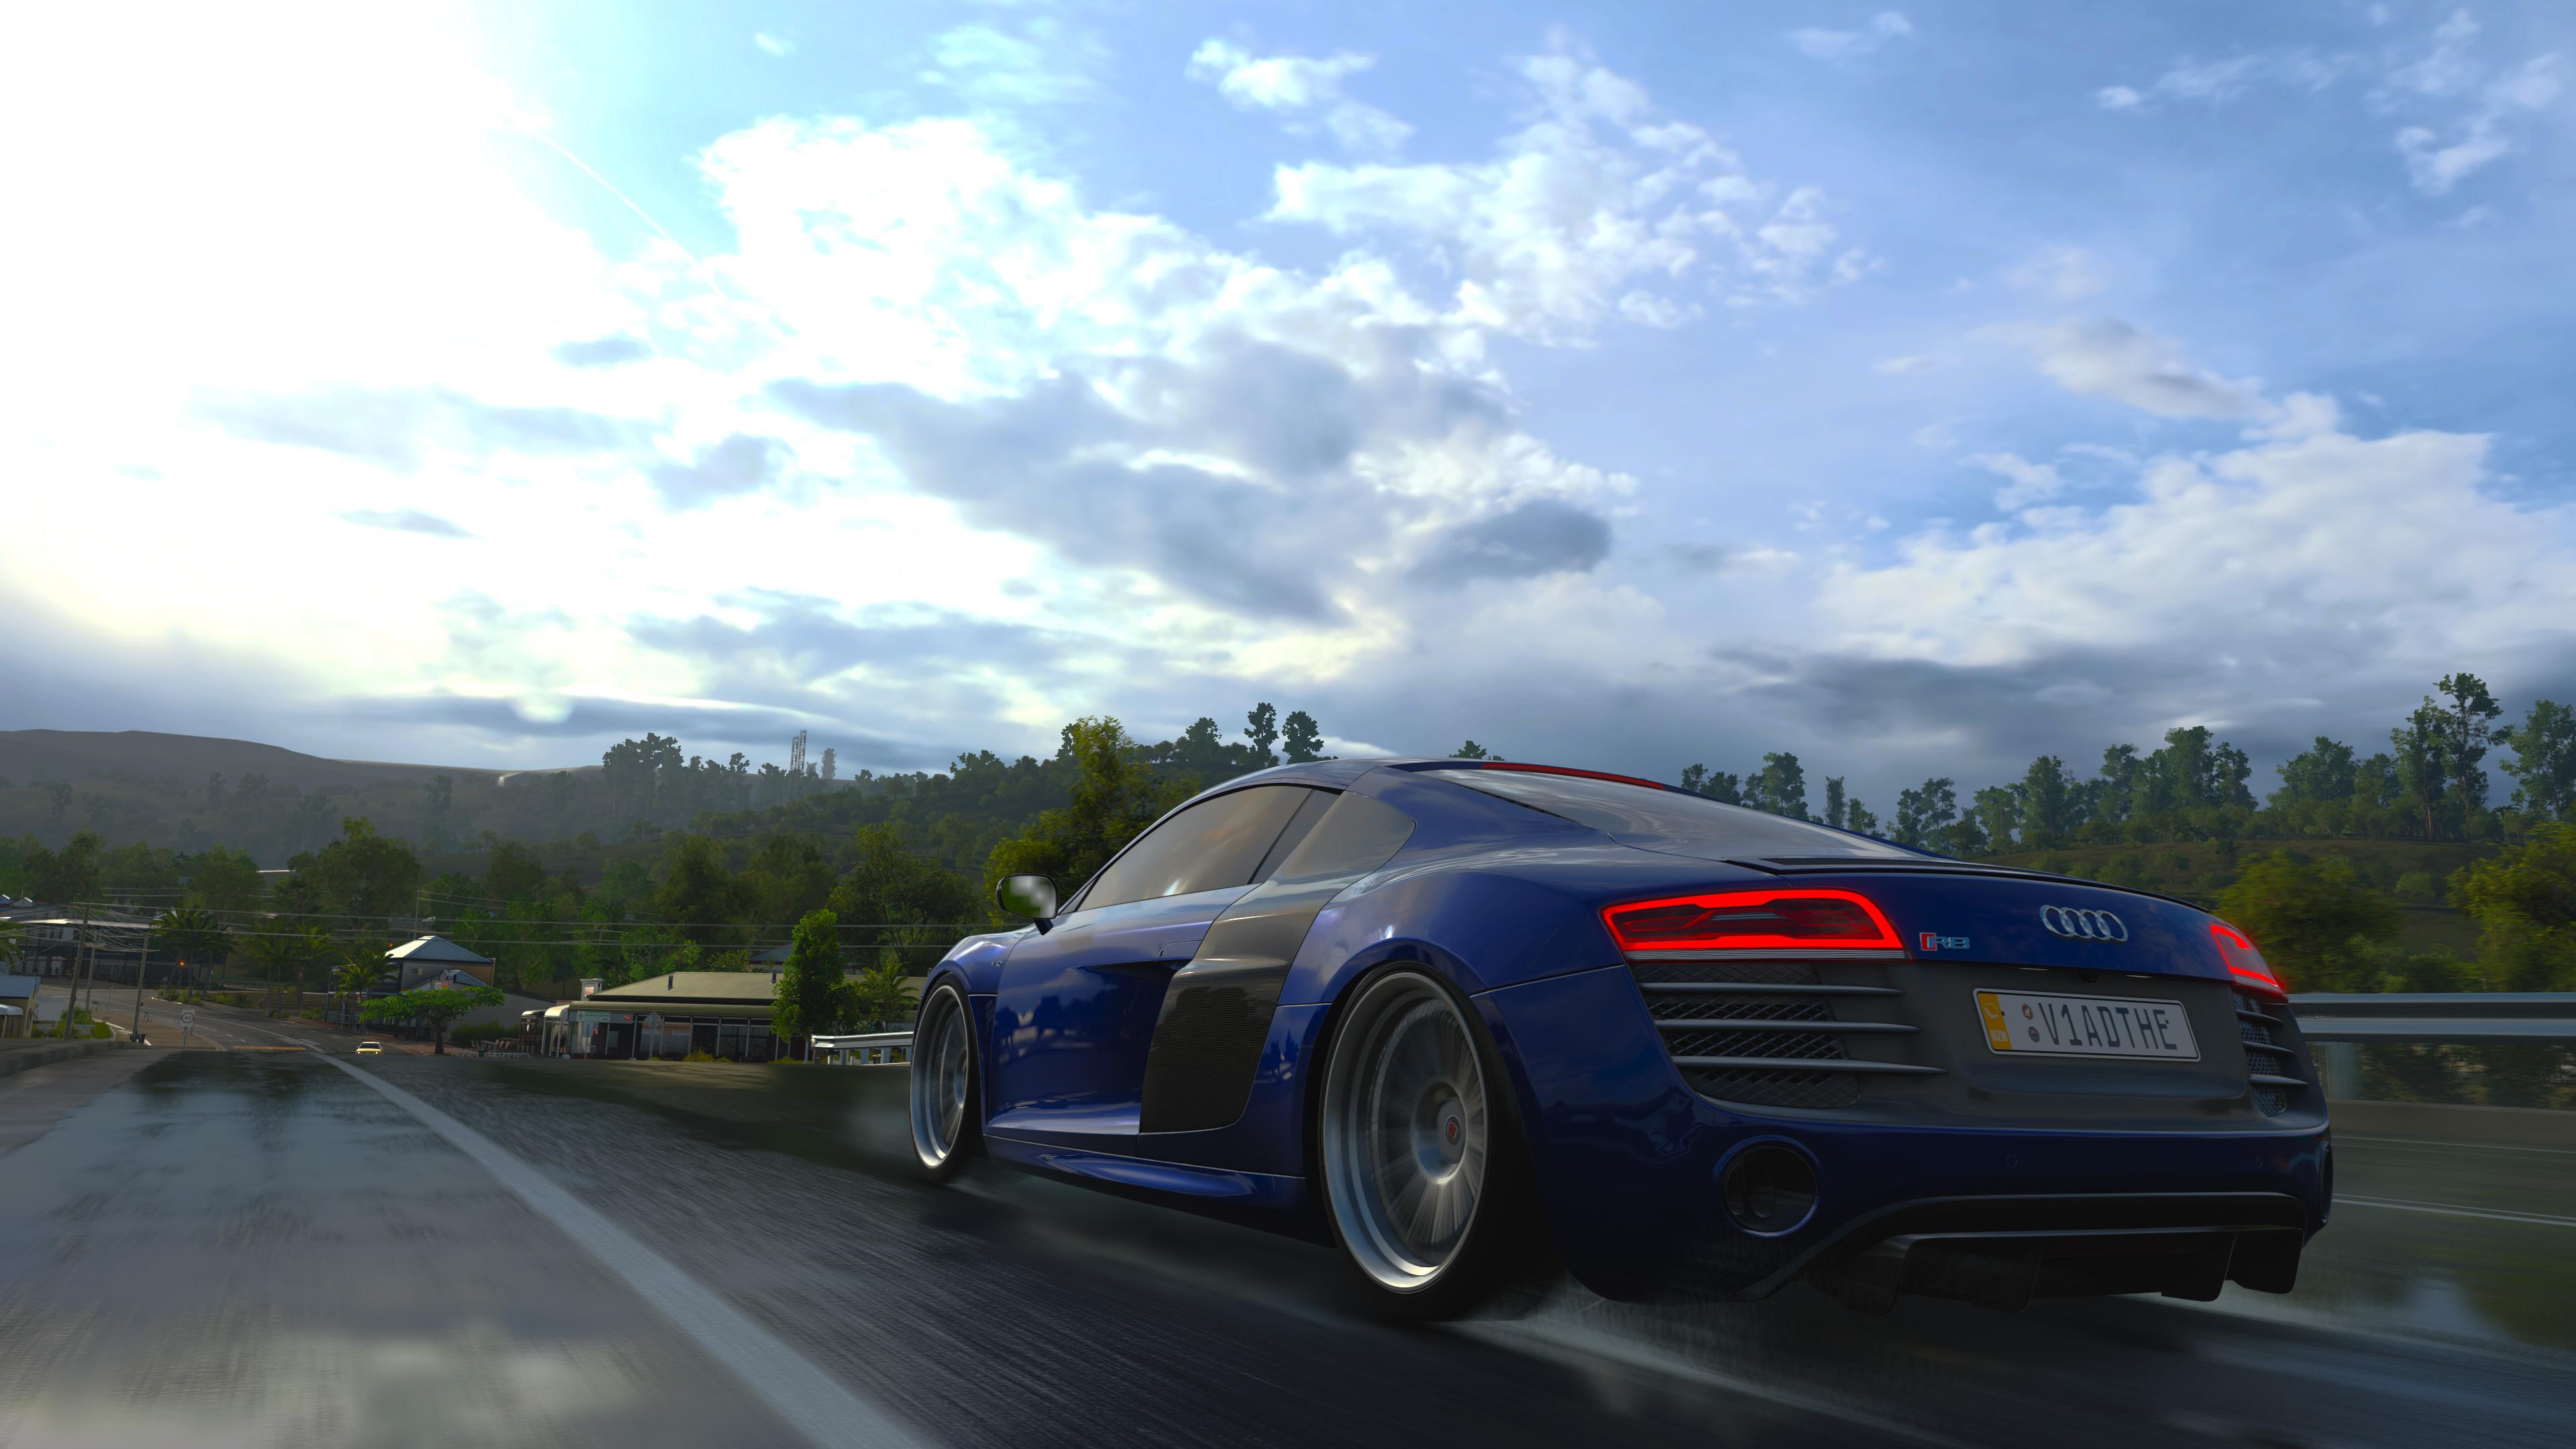 Audi r8 forza horizon 3 hd games 4k wallpapers images - Is forza horizon 3 4k ...